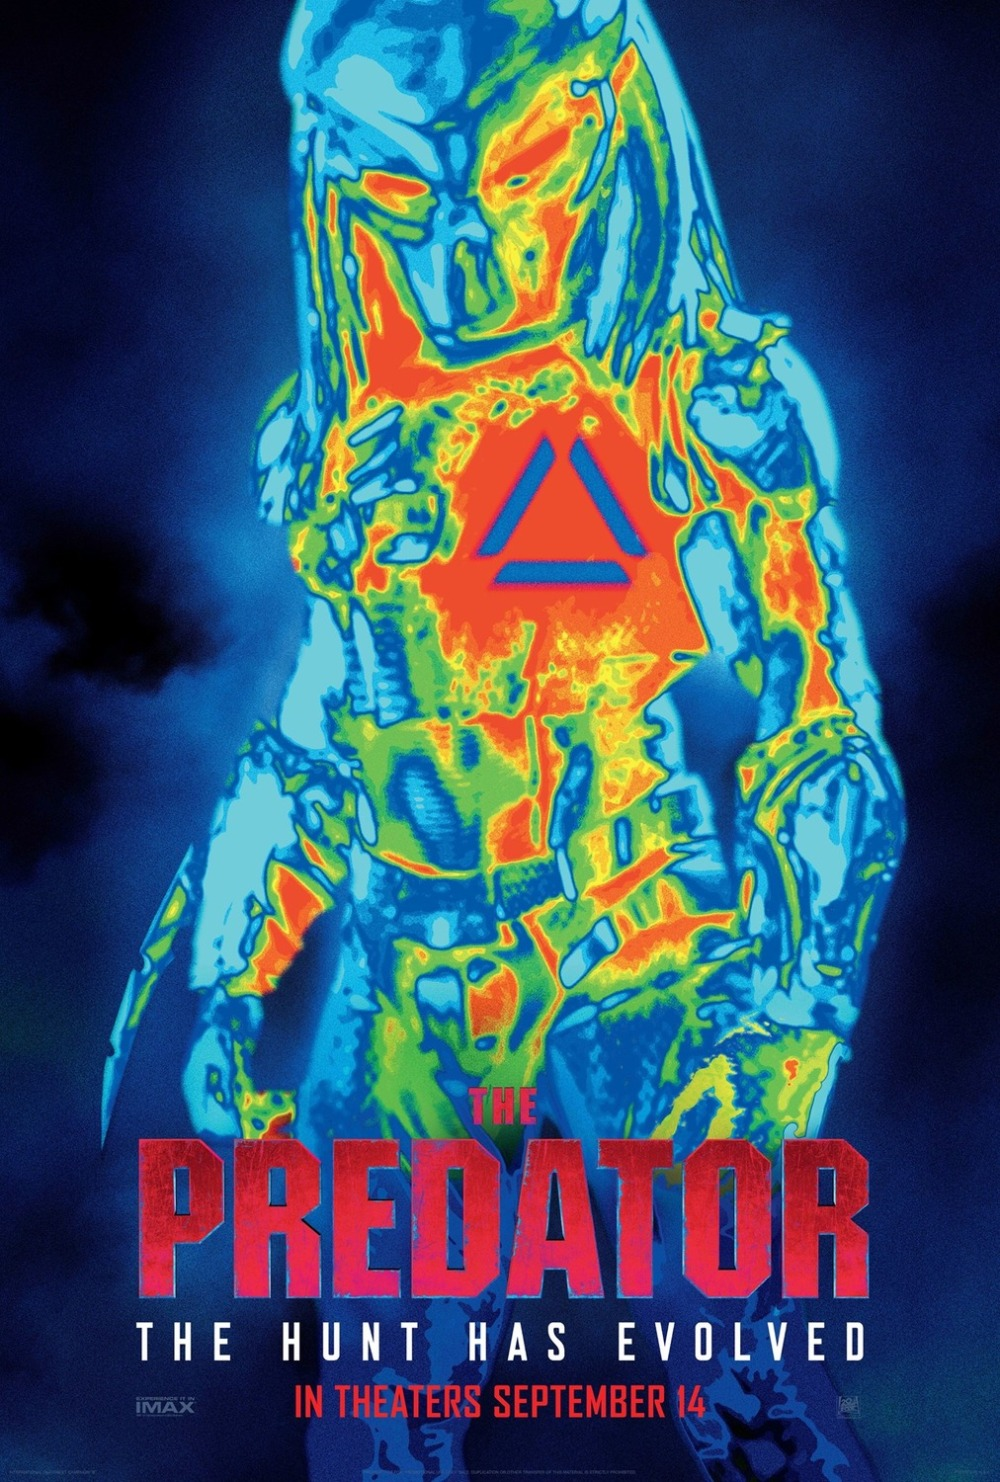 The Predator movie poster version 3